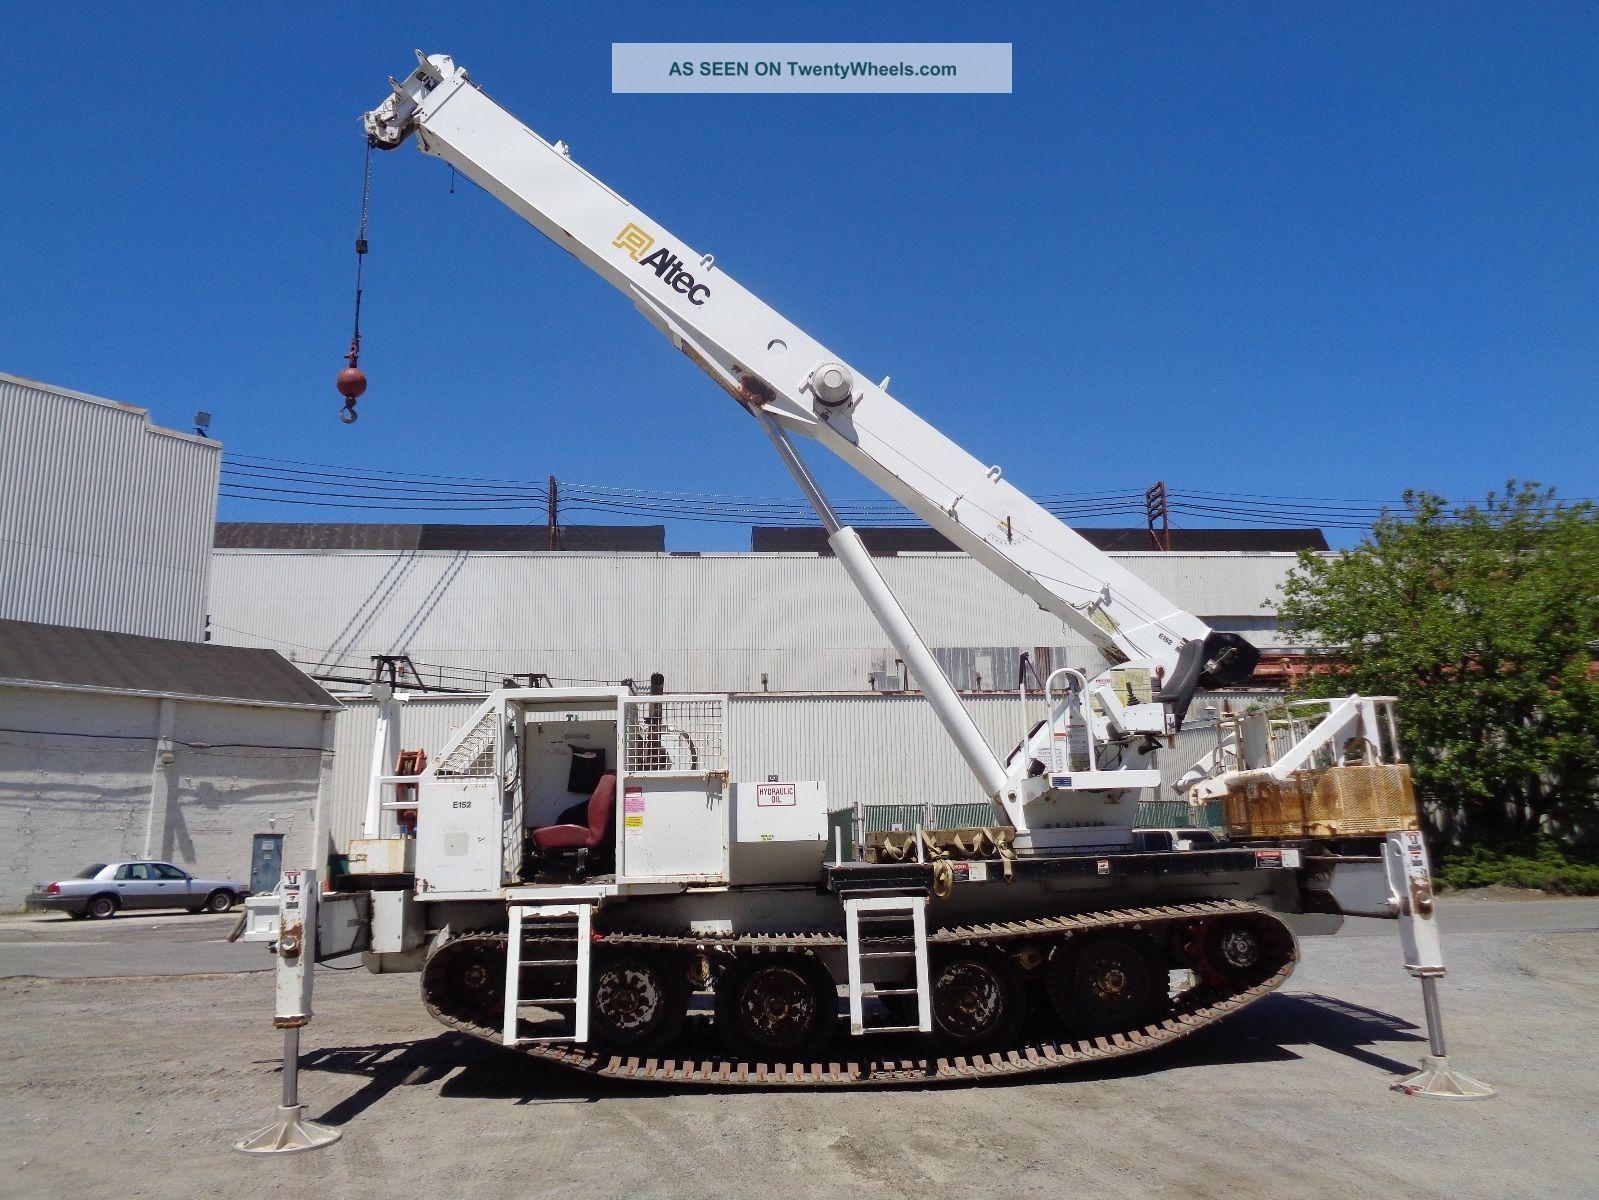 2007 Altec 26 Ton,  Hydraulic Rough Terrain Crane Boom Lift - 149 Ft Height Cranes photo